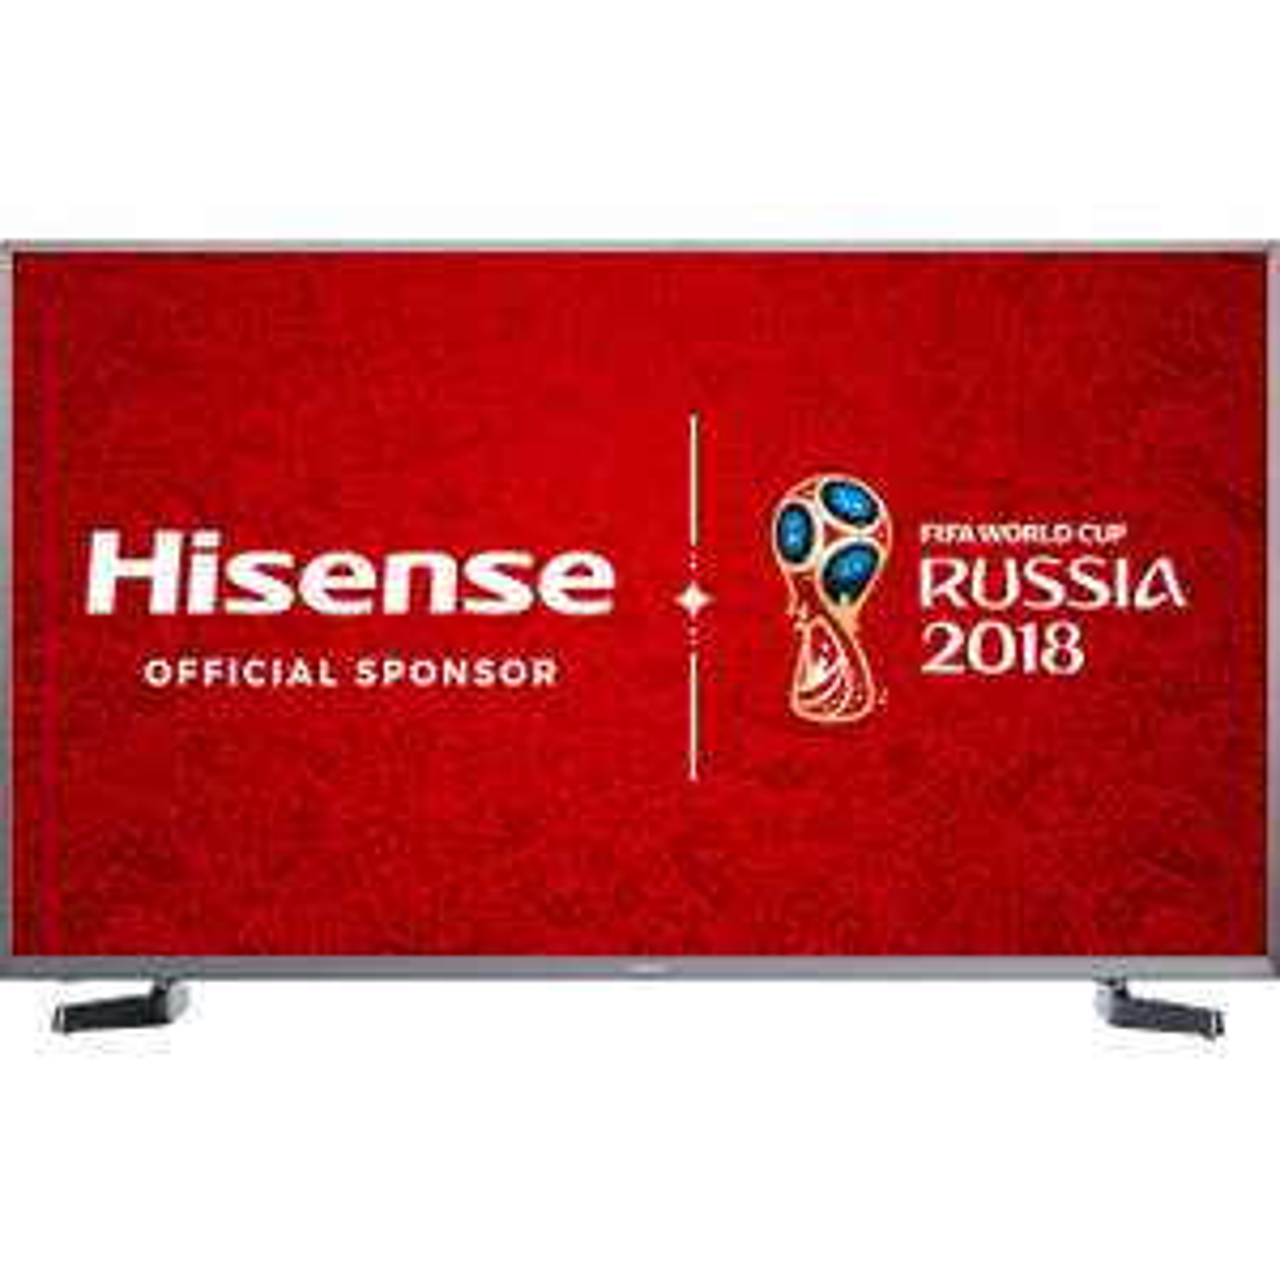 "Hisense H50N5900 50"" 4K Smart Tv £379.00 ao.com"